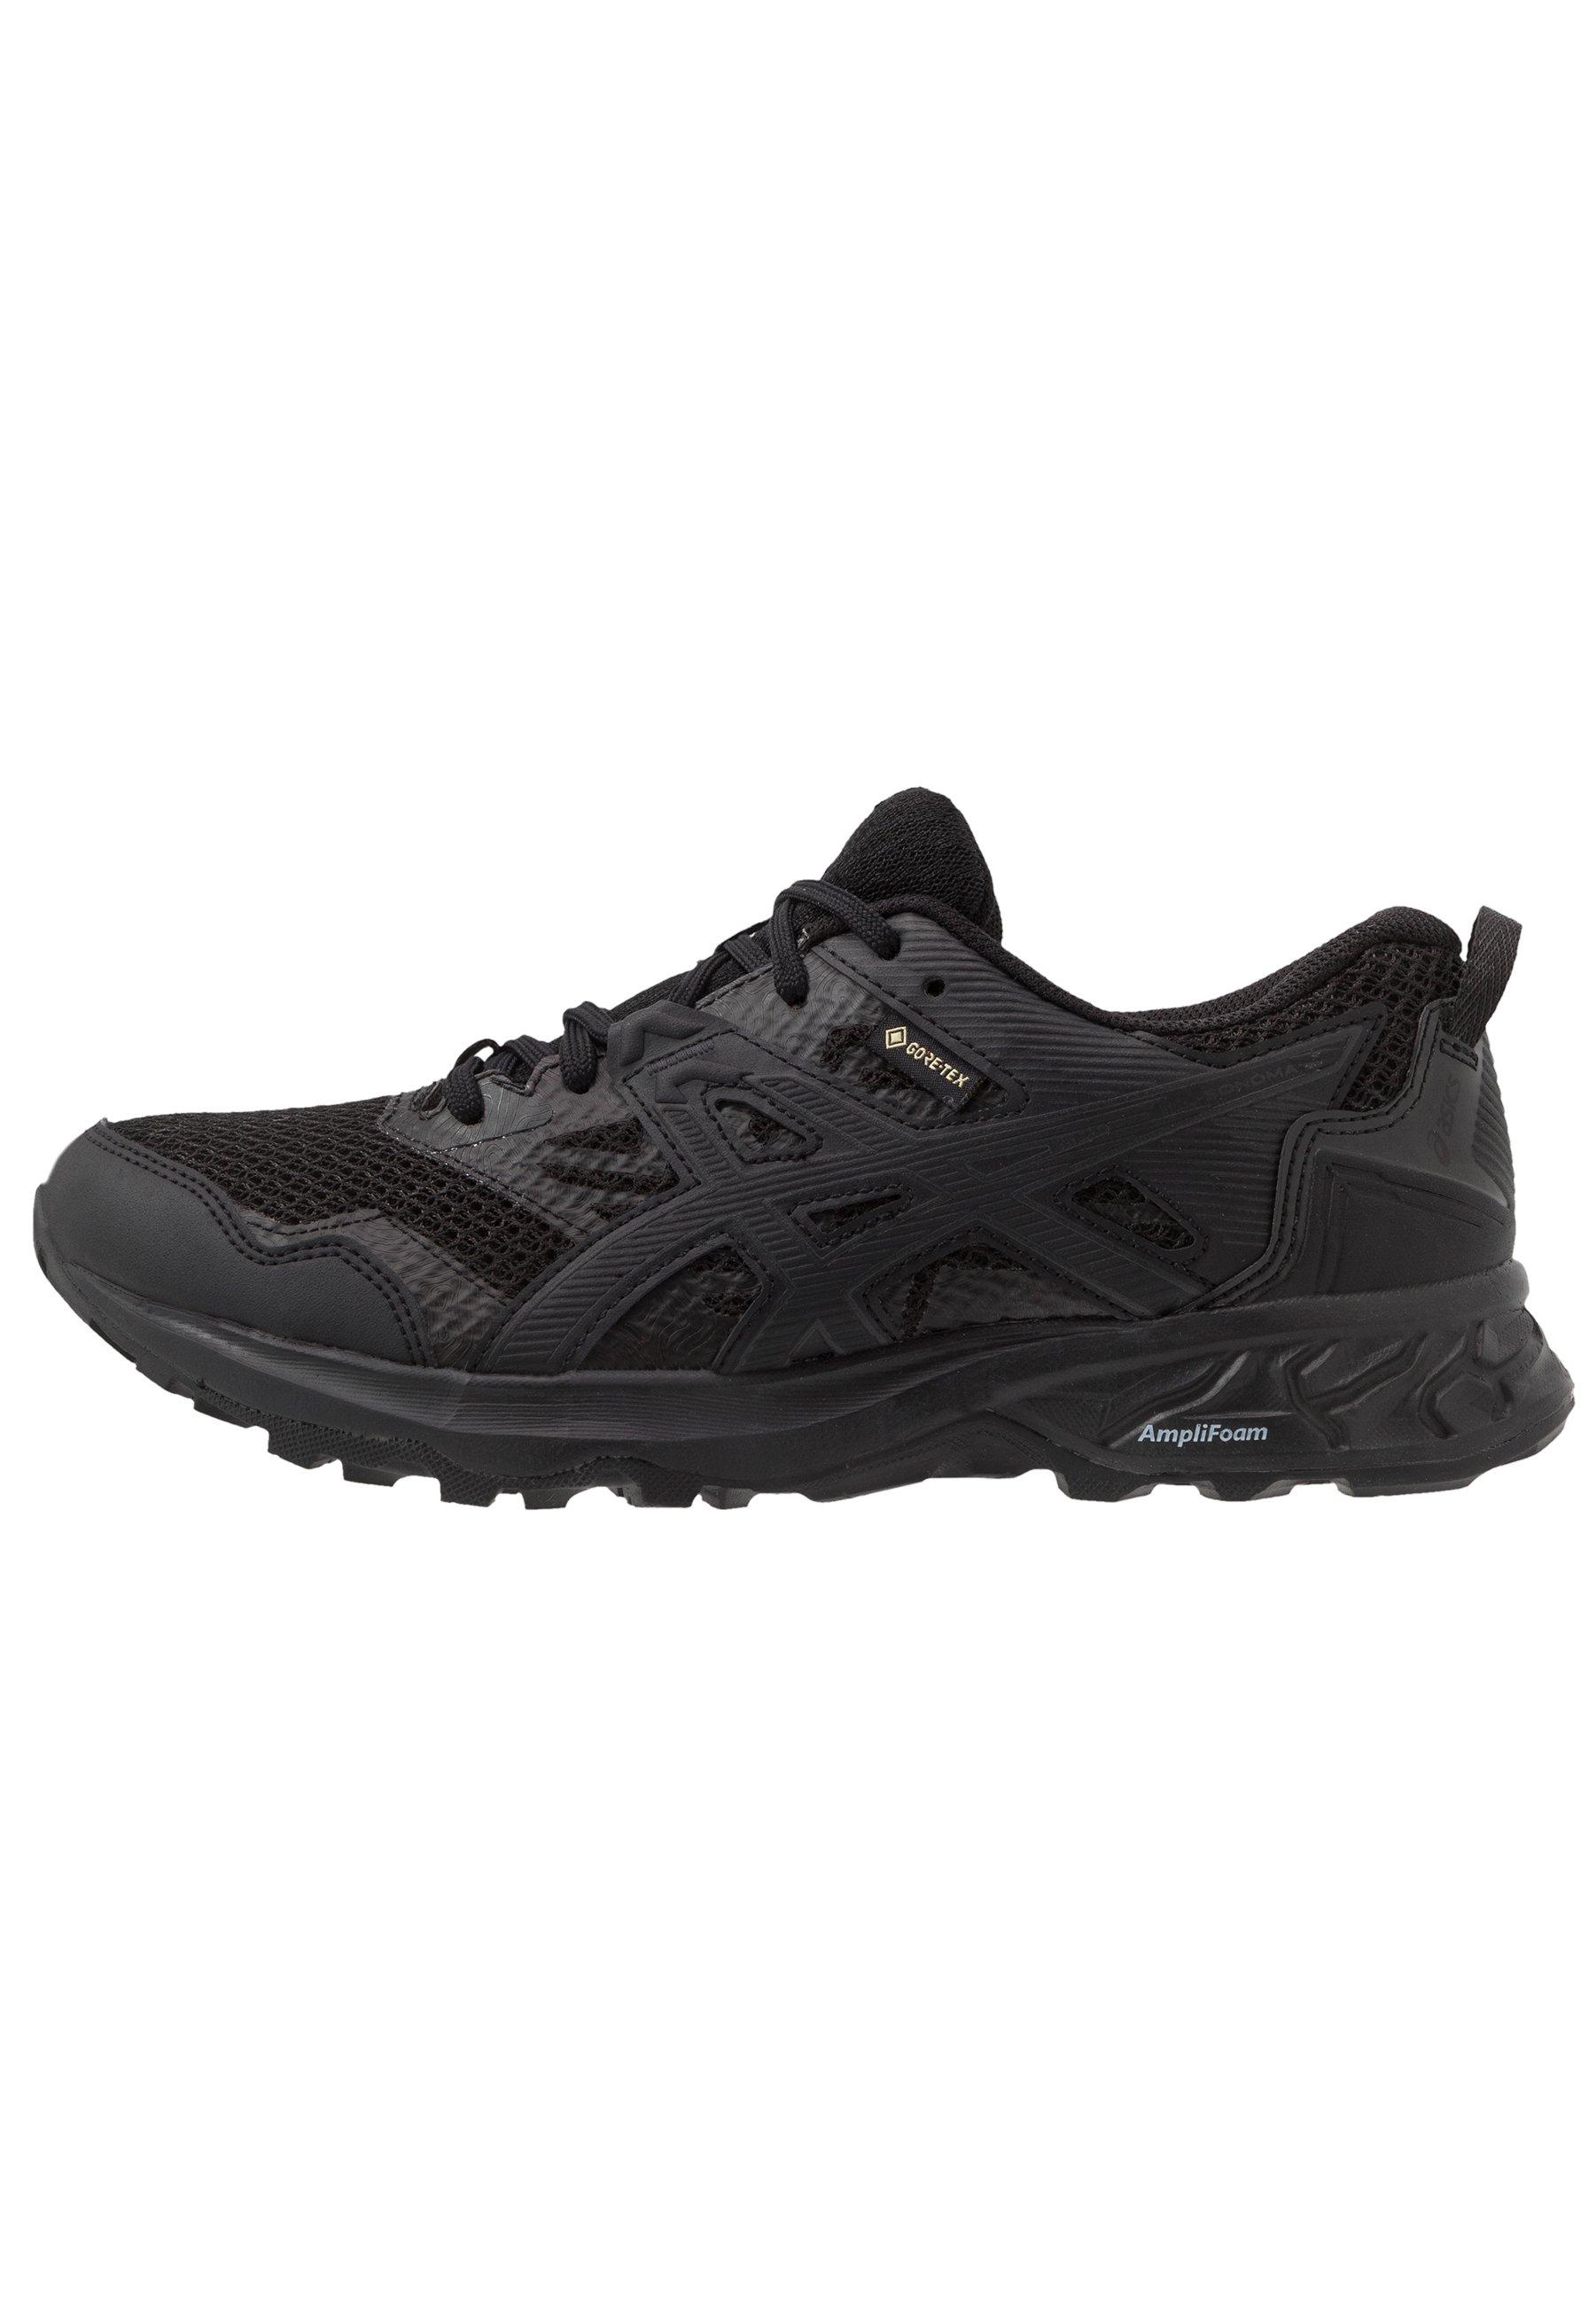 GEL-SONOMA 5 G-TX - Trail running shoes - black